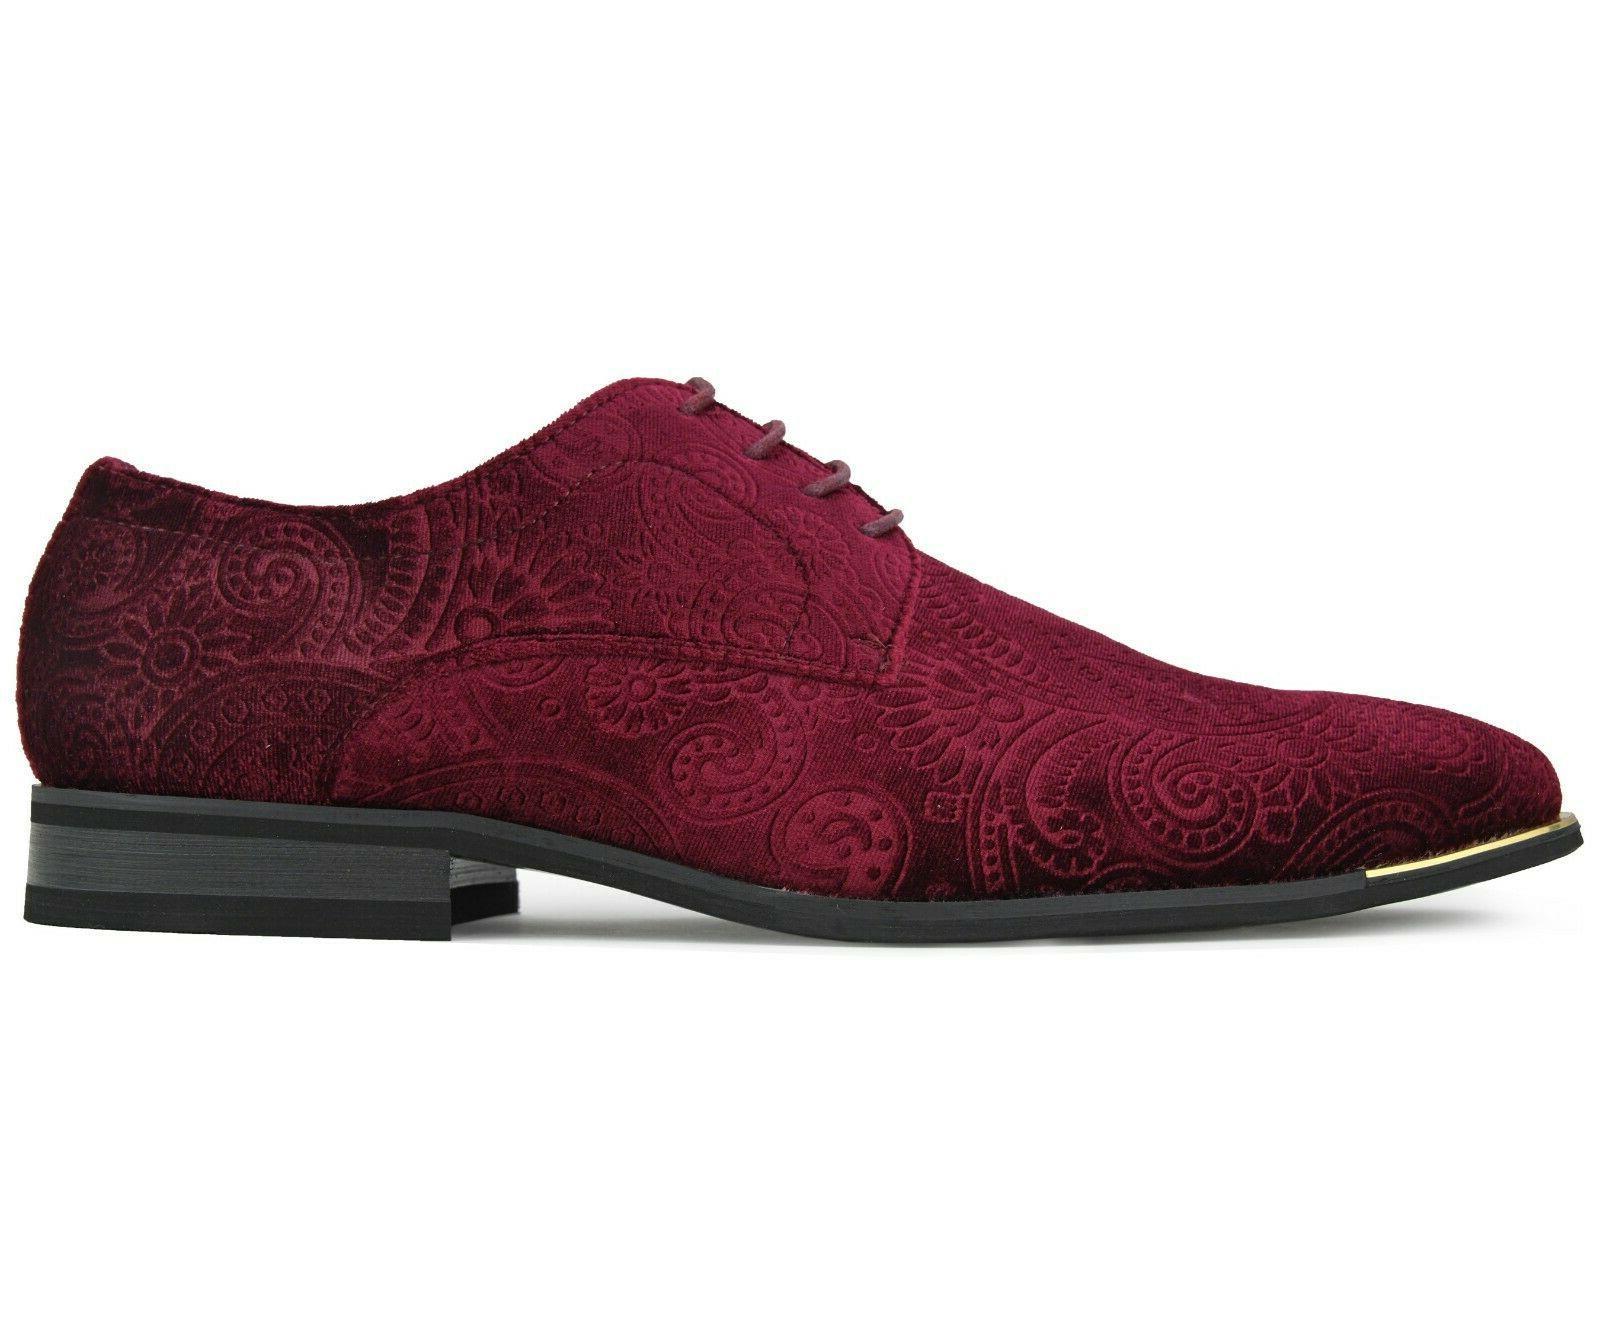 Amali Lace Dress Shoes Oxfords